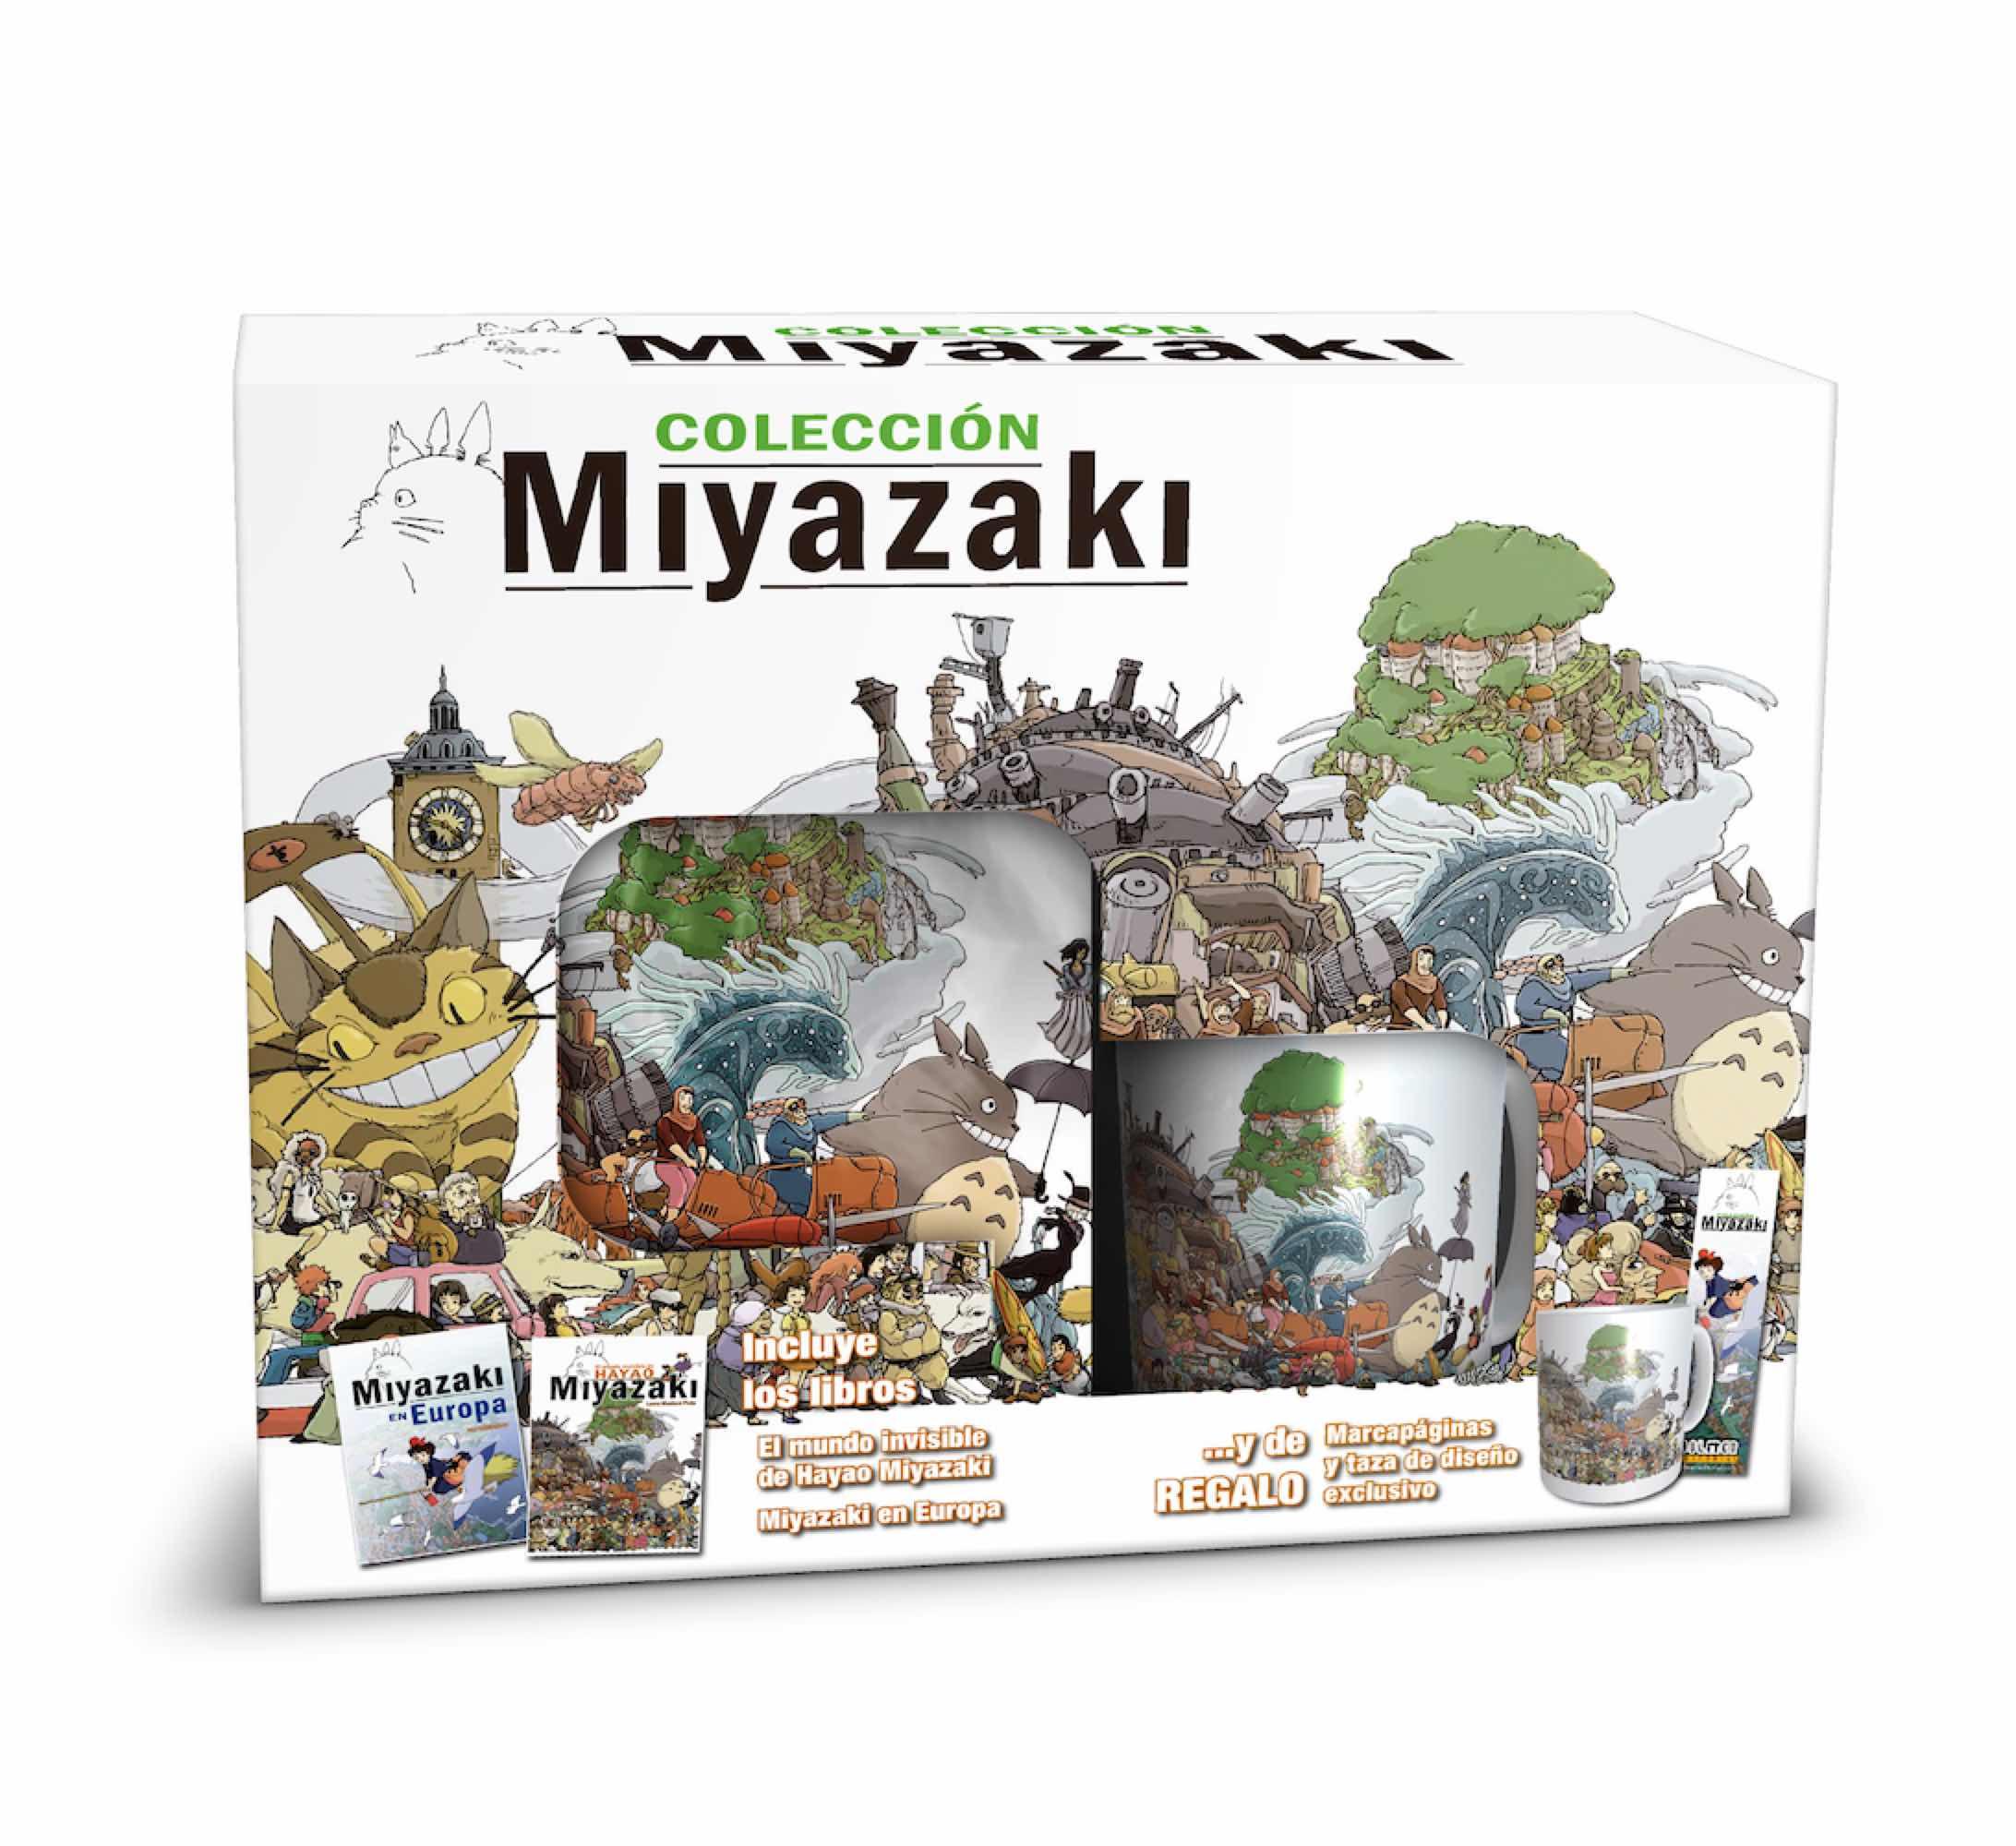 CAJA EXCLUSIVA. COLECCION MIYAZAKI